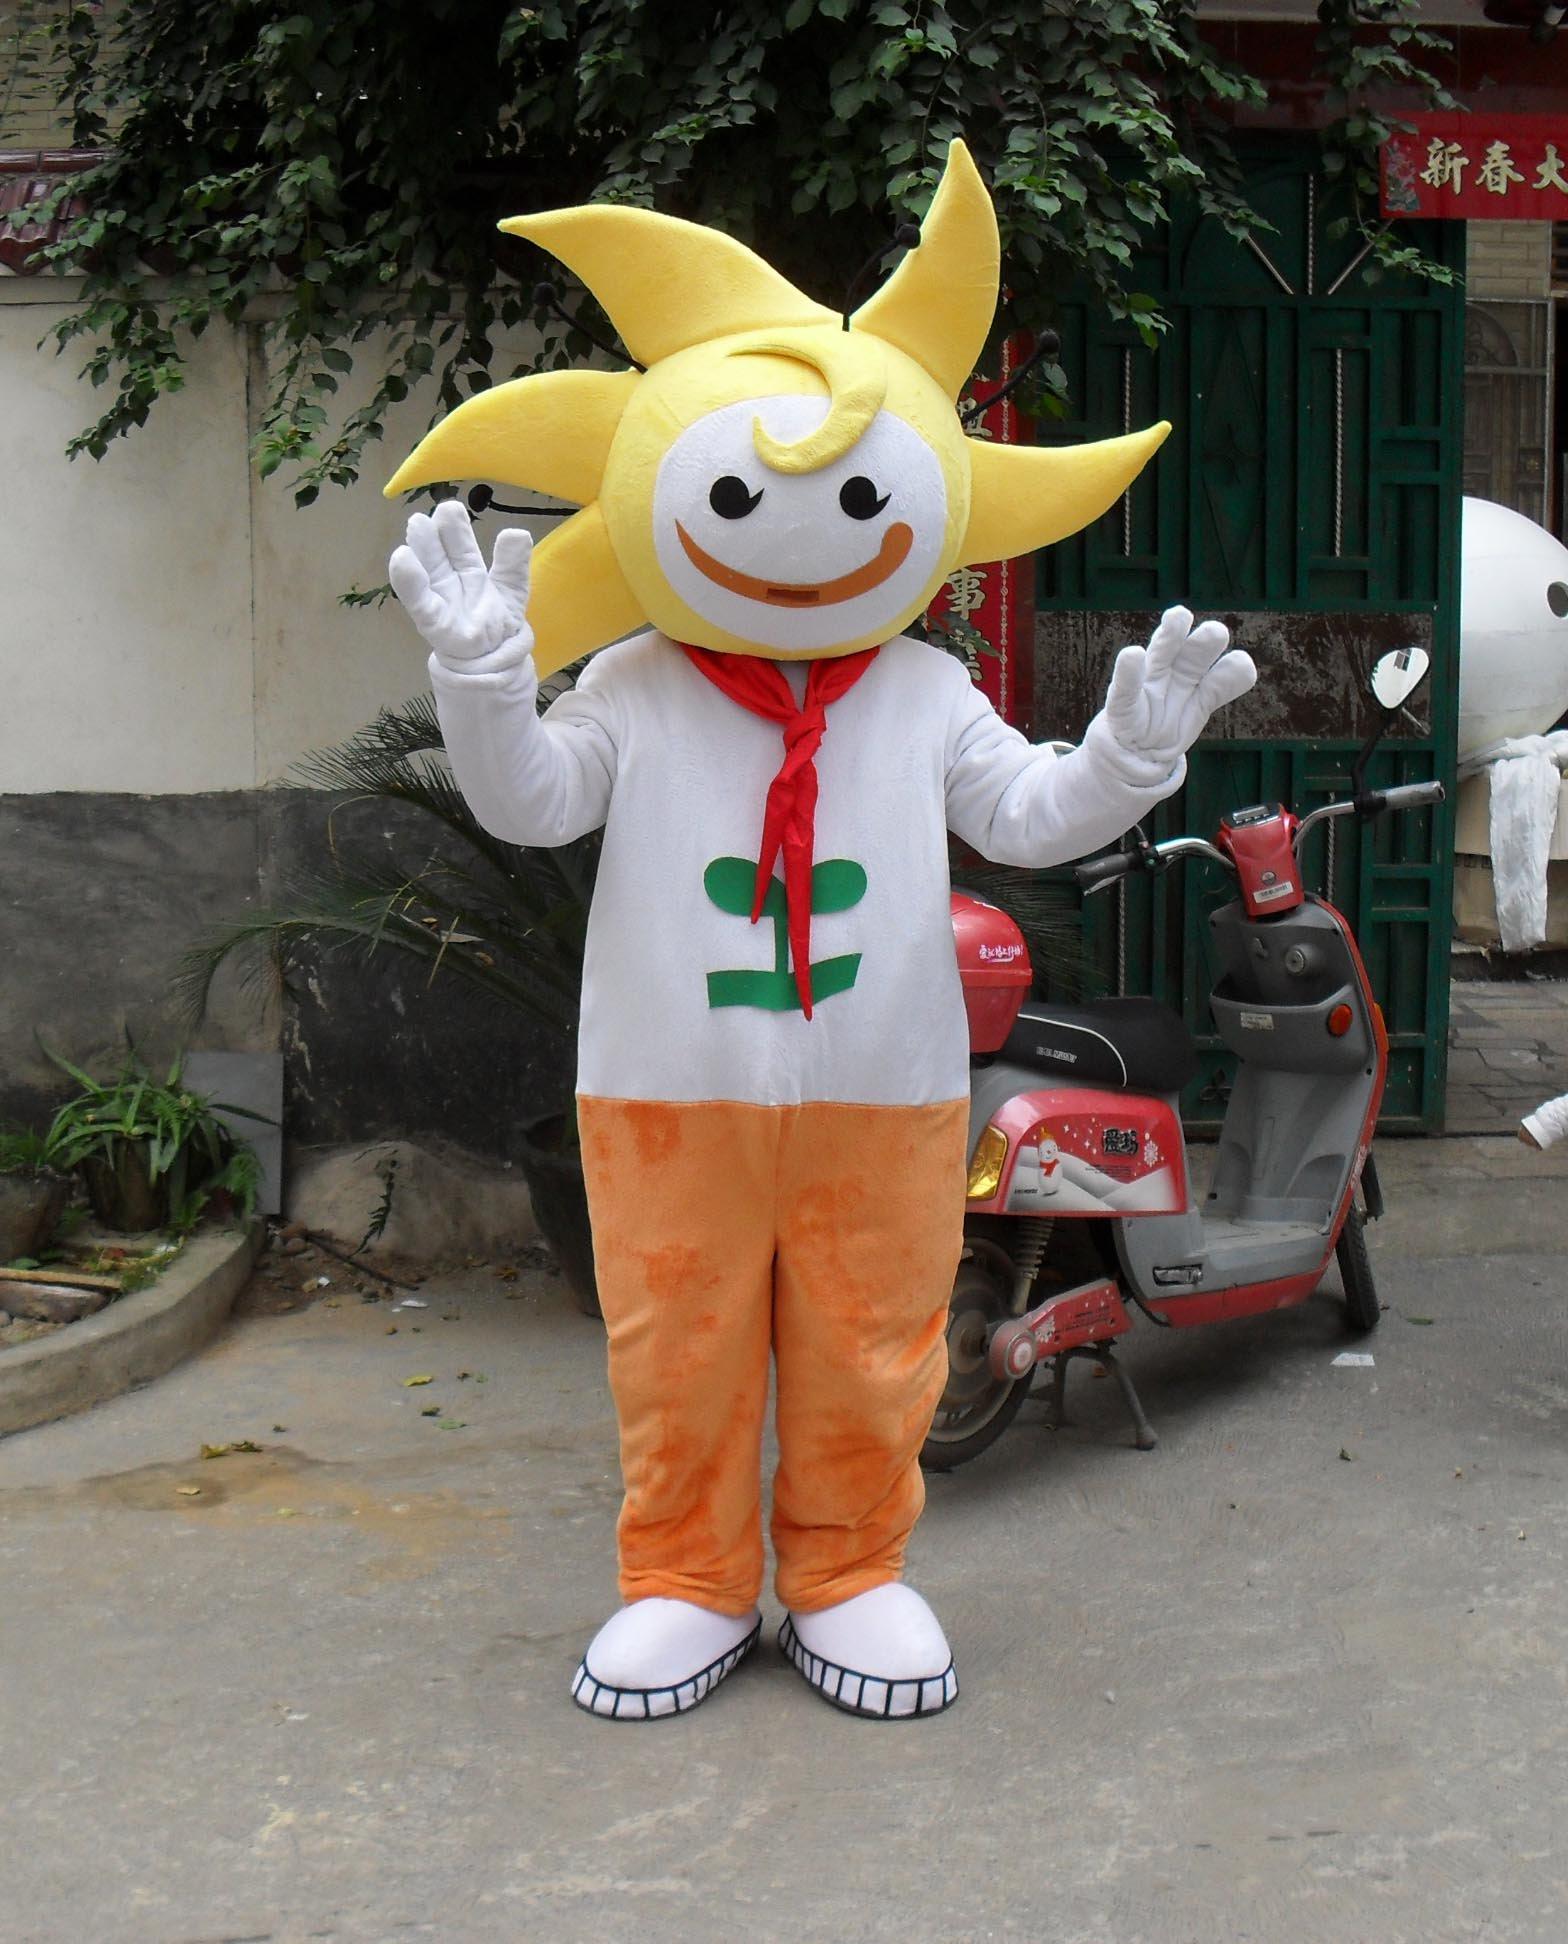 Little Sun Cartoon Doll Clothing Doll Clothing Cartoon Walking Doll Cartoon Props Corporate Mascot Dolls Mascot Costume